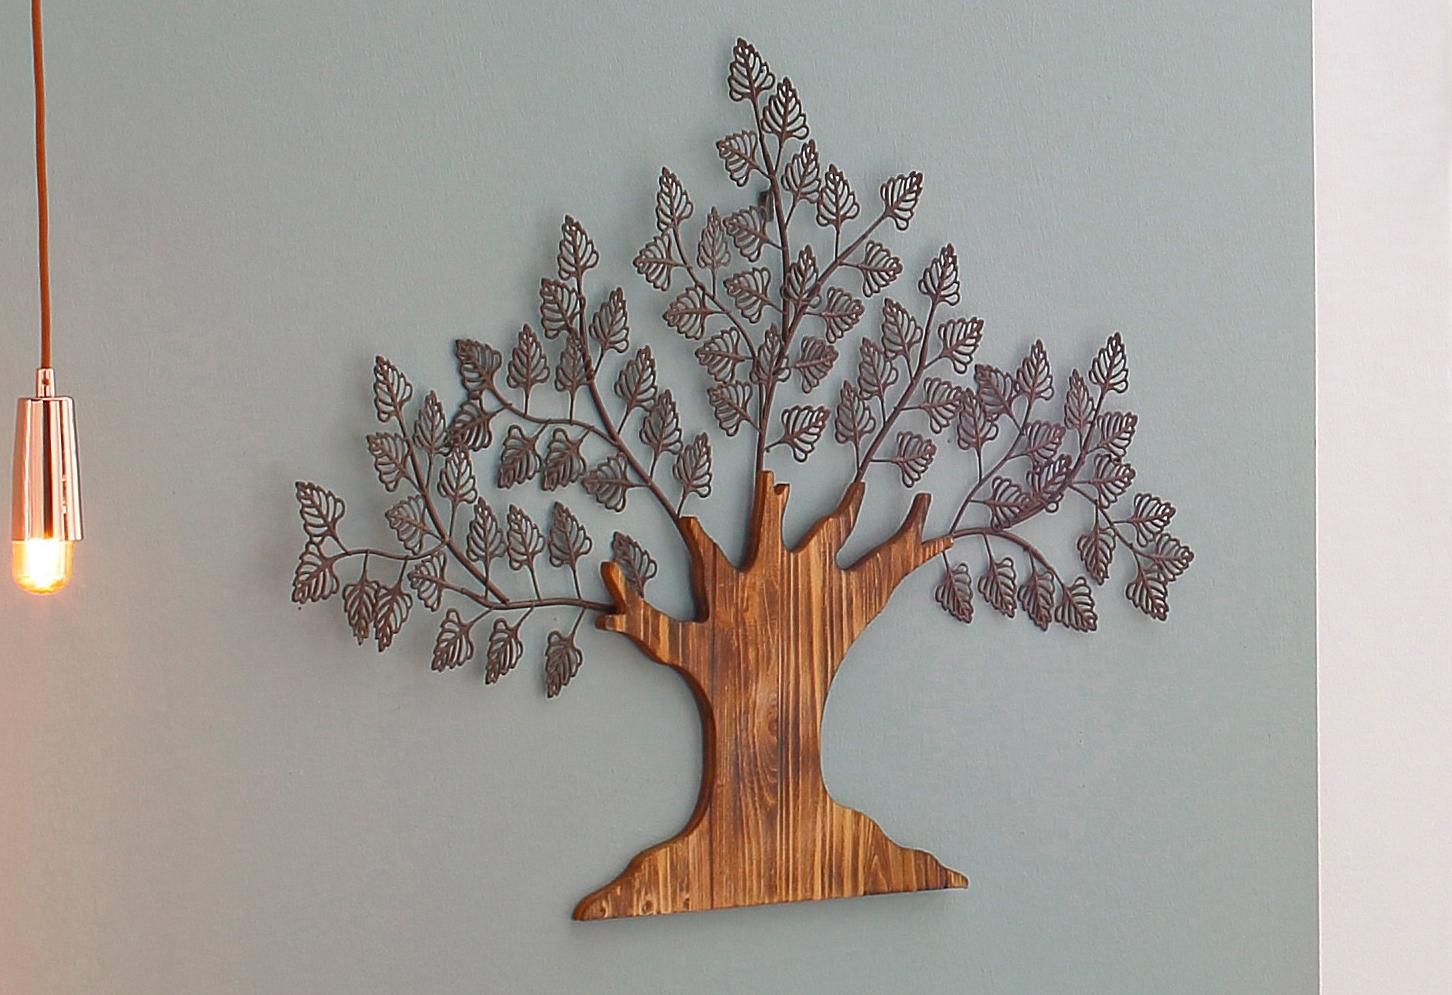 home affaire wanddecoratie boom makkelijk gevonden otto